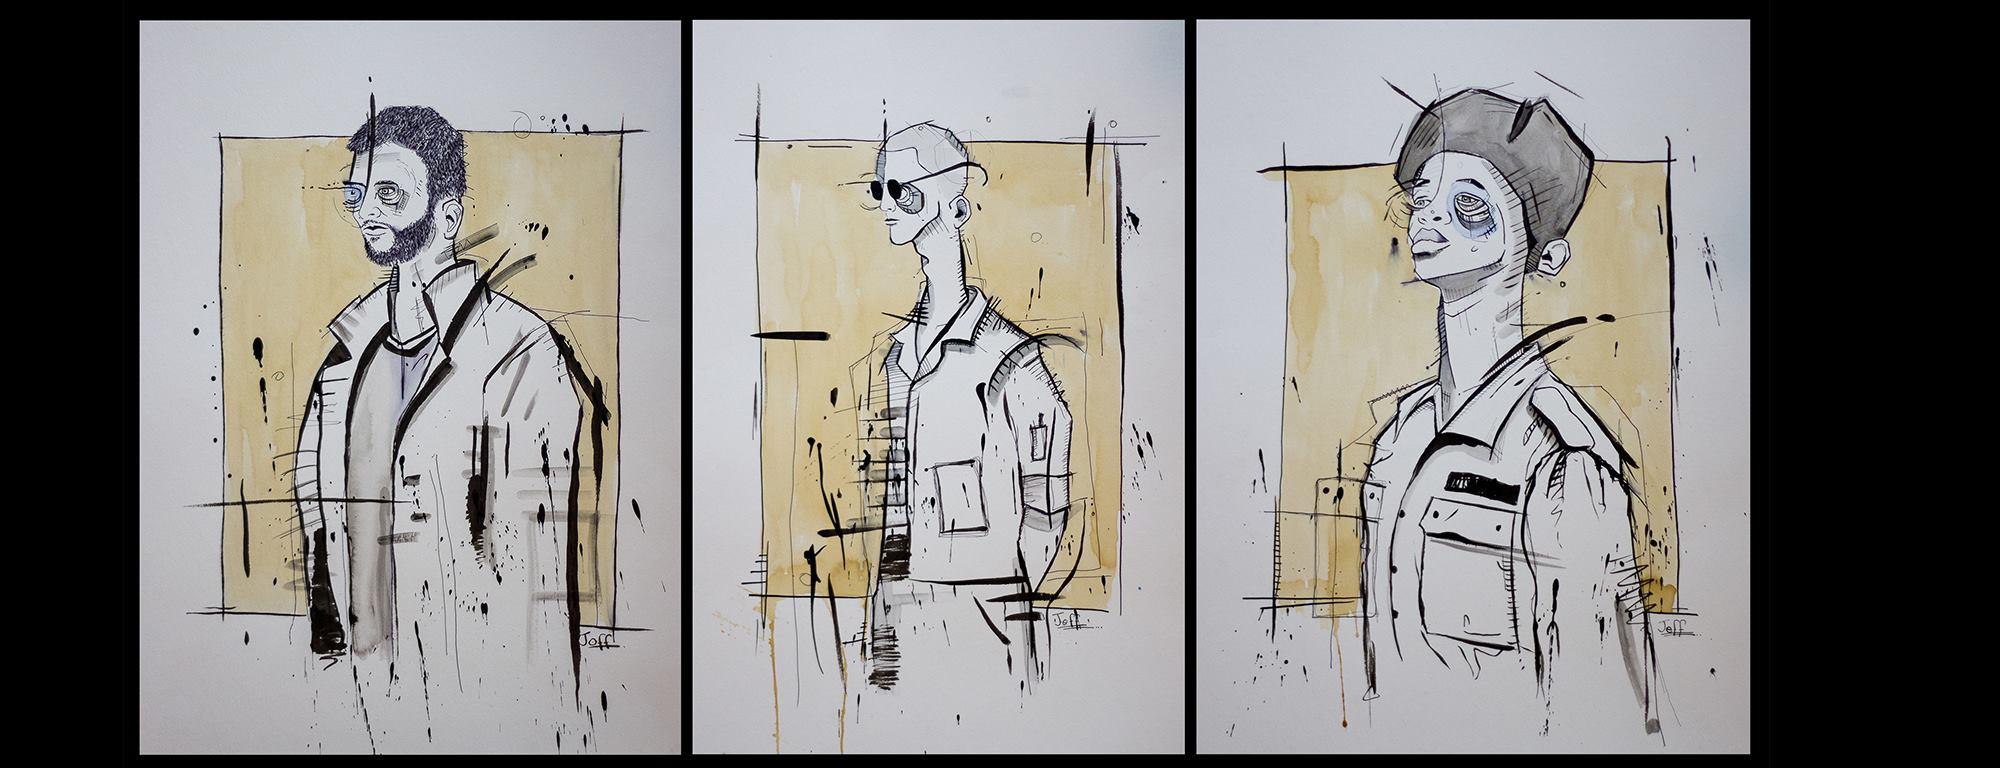 Portraits of Twenty Journey Men by Joff